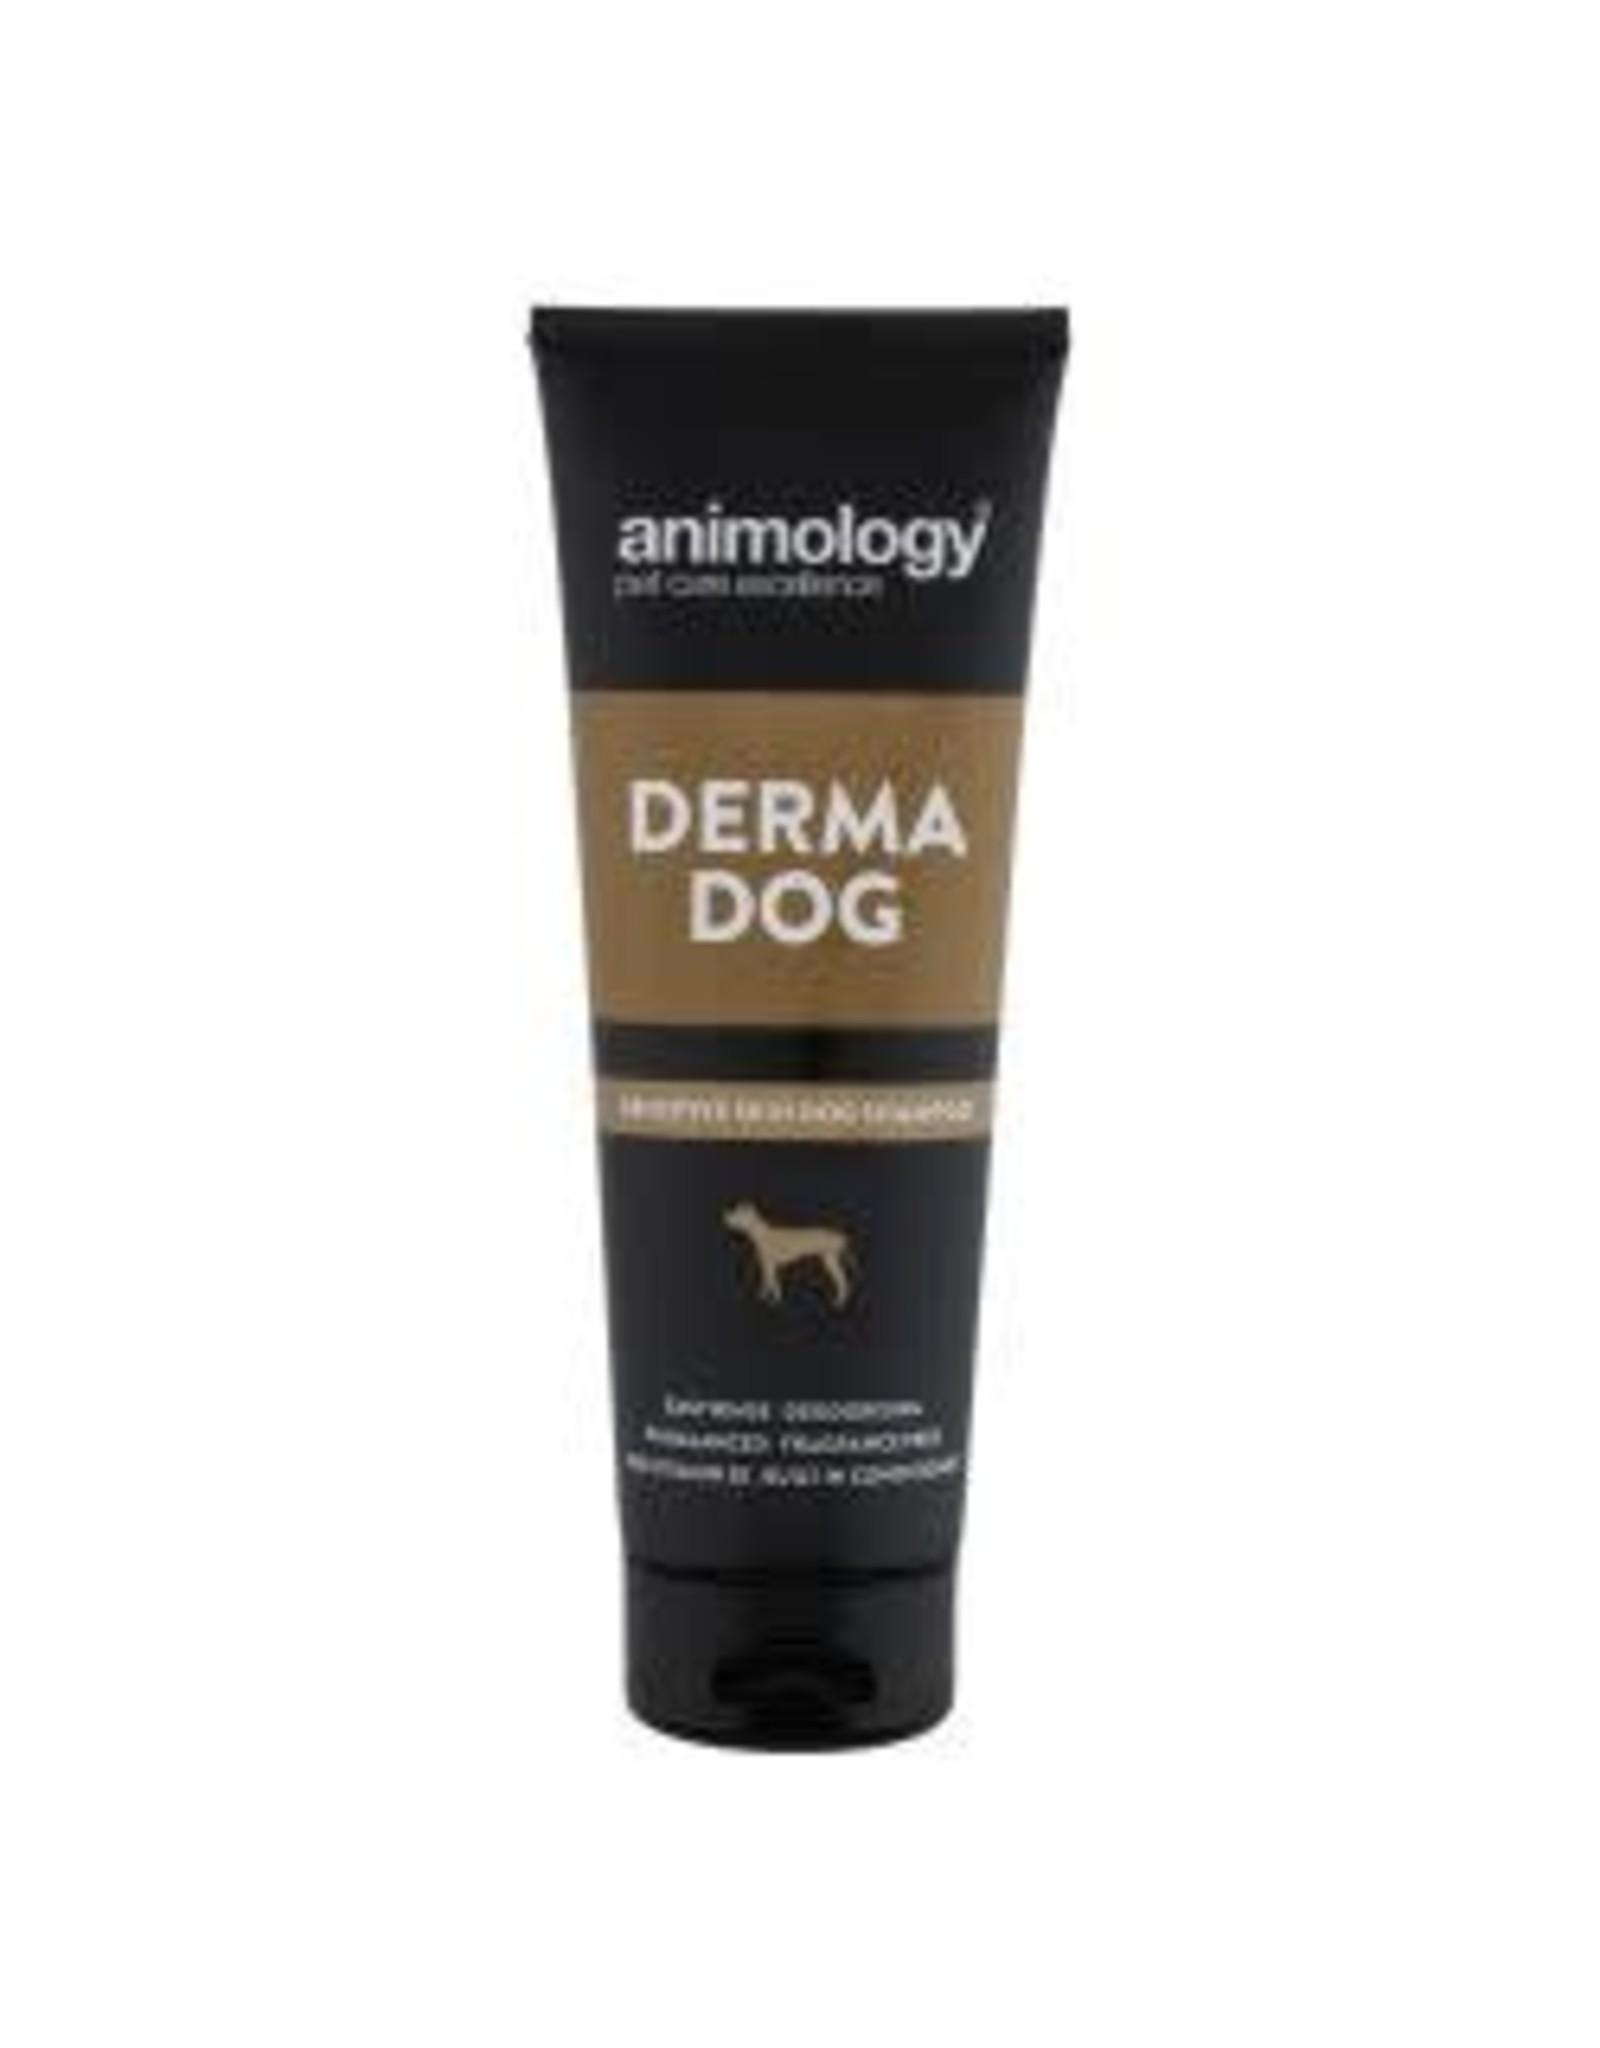 Animology Animology Derma Dog Shampoo 250ml